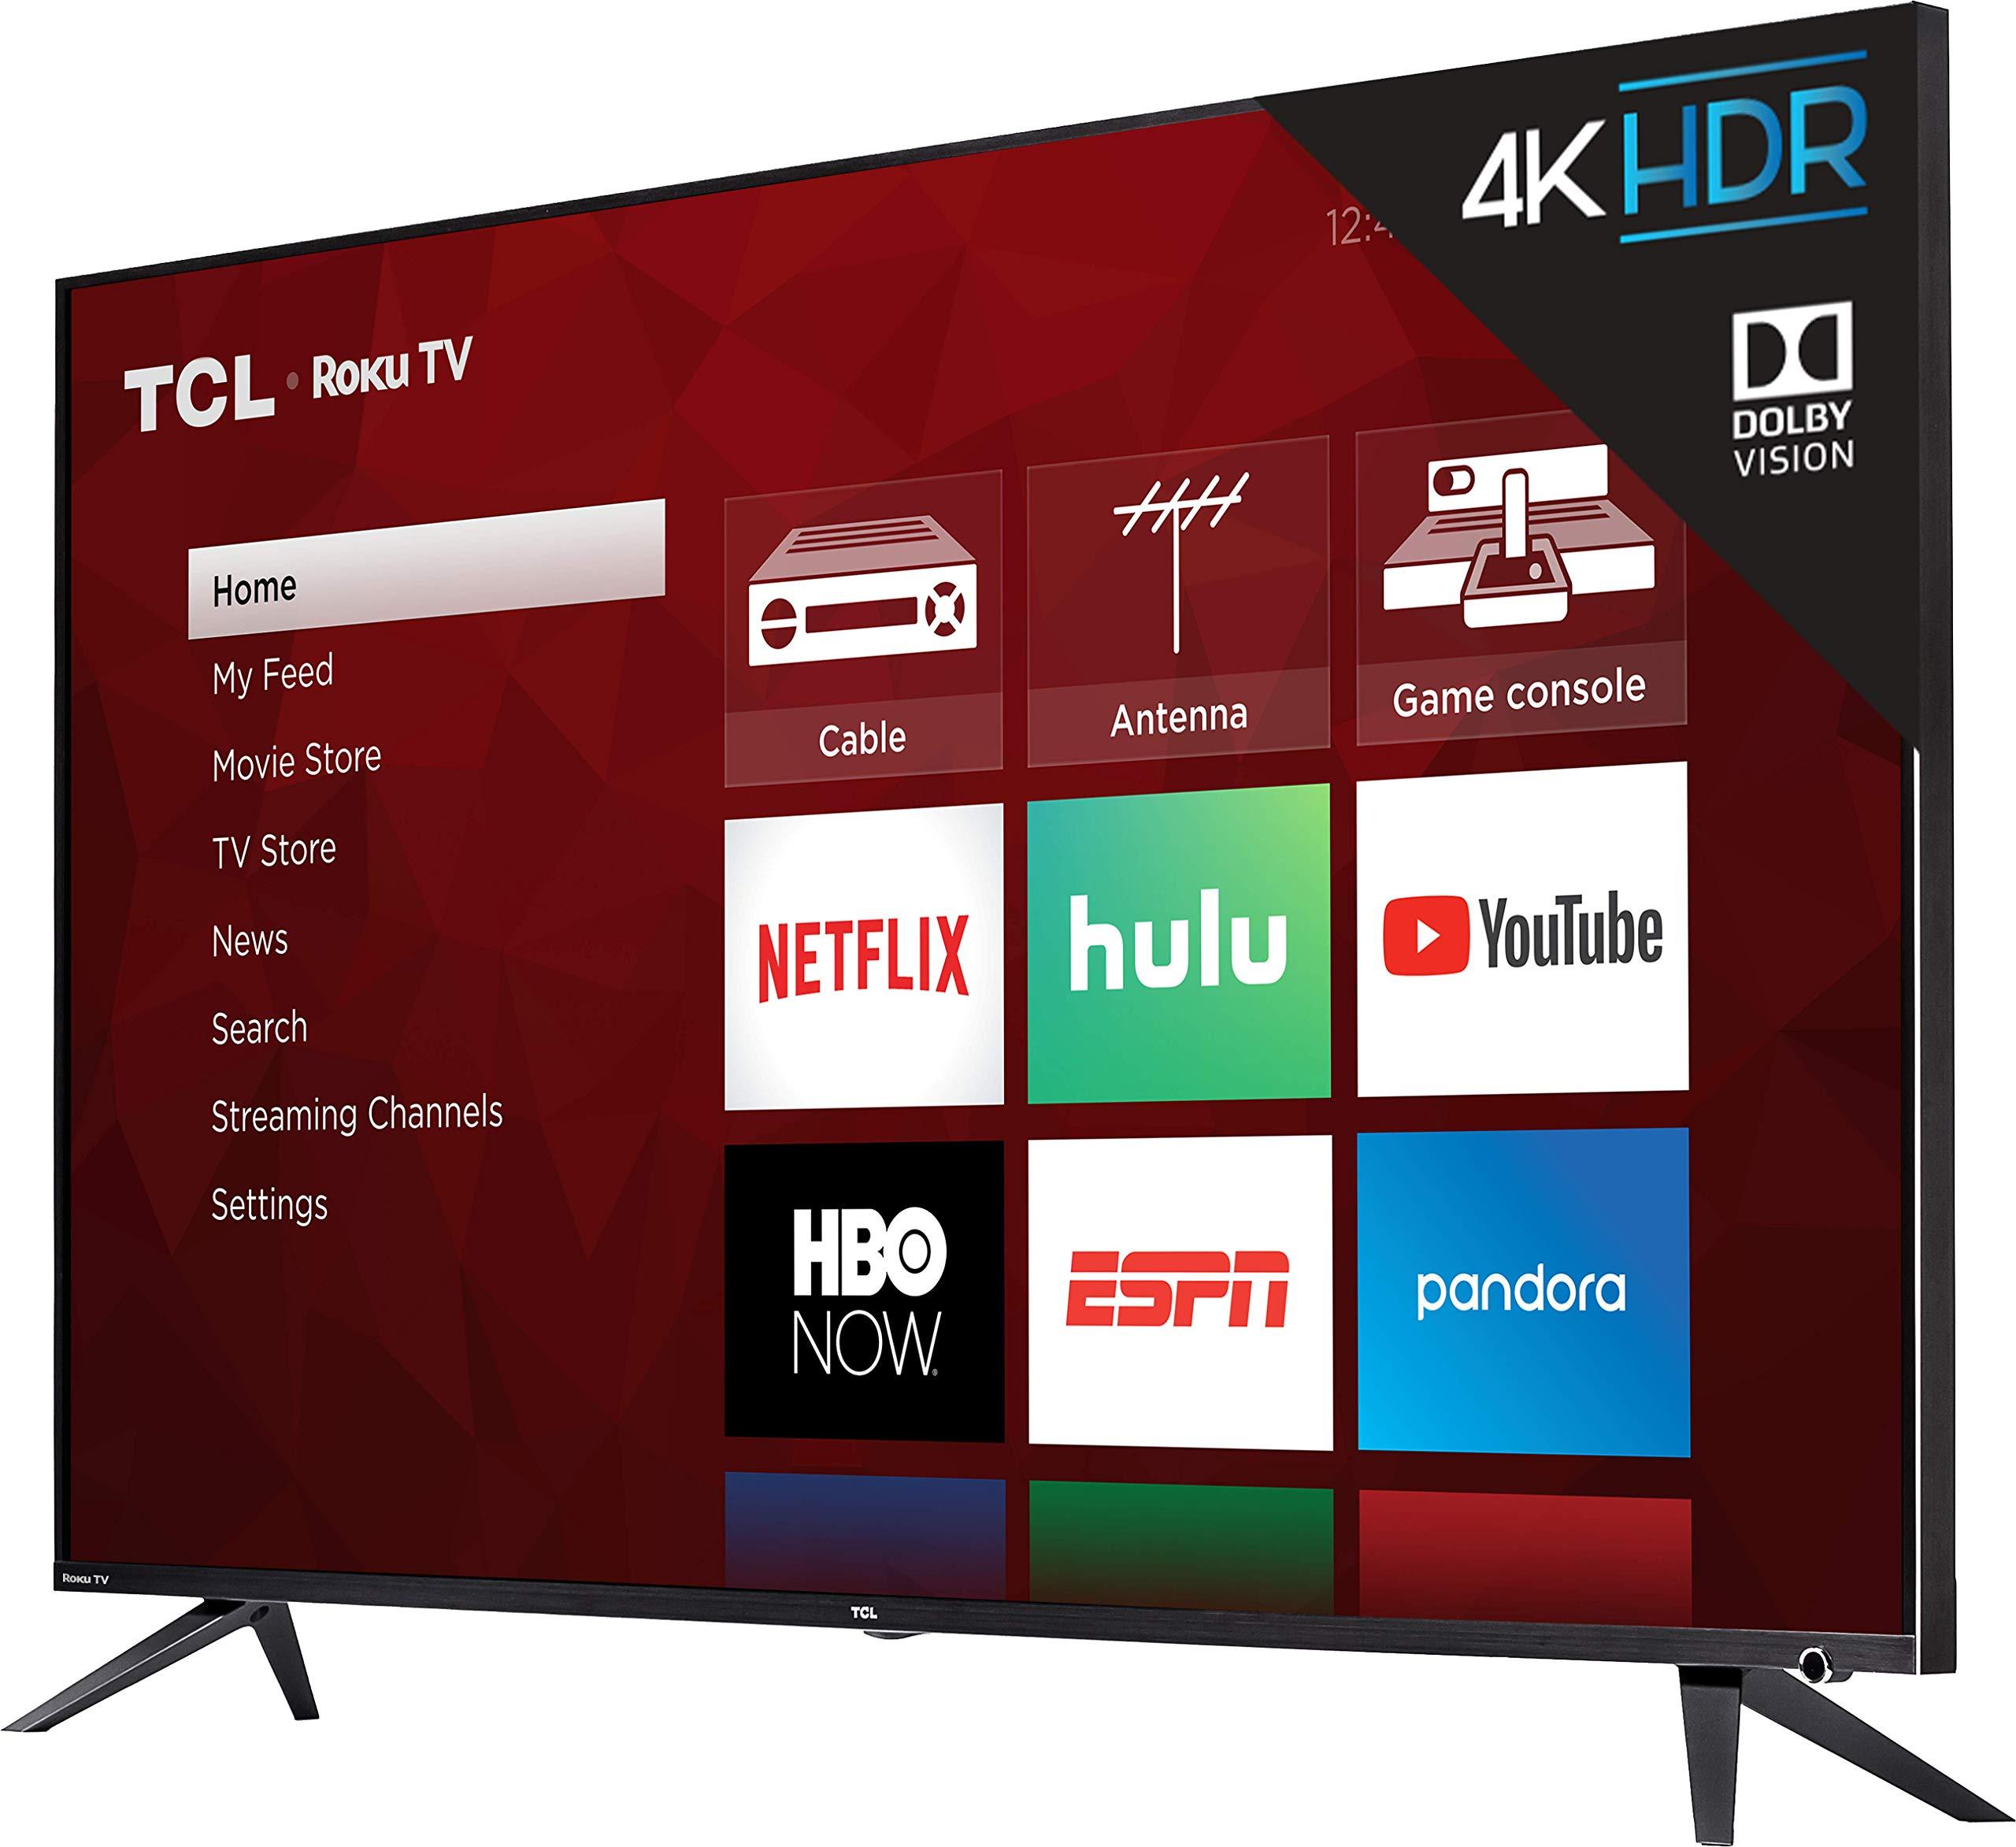 TCL 65R617 65-Inch 4K Ultra HD Roku Smart LED TV (2018 Model) by TCL (Image #7)